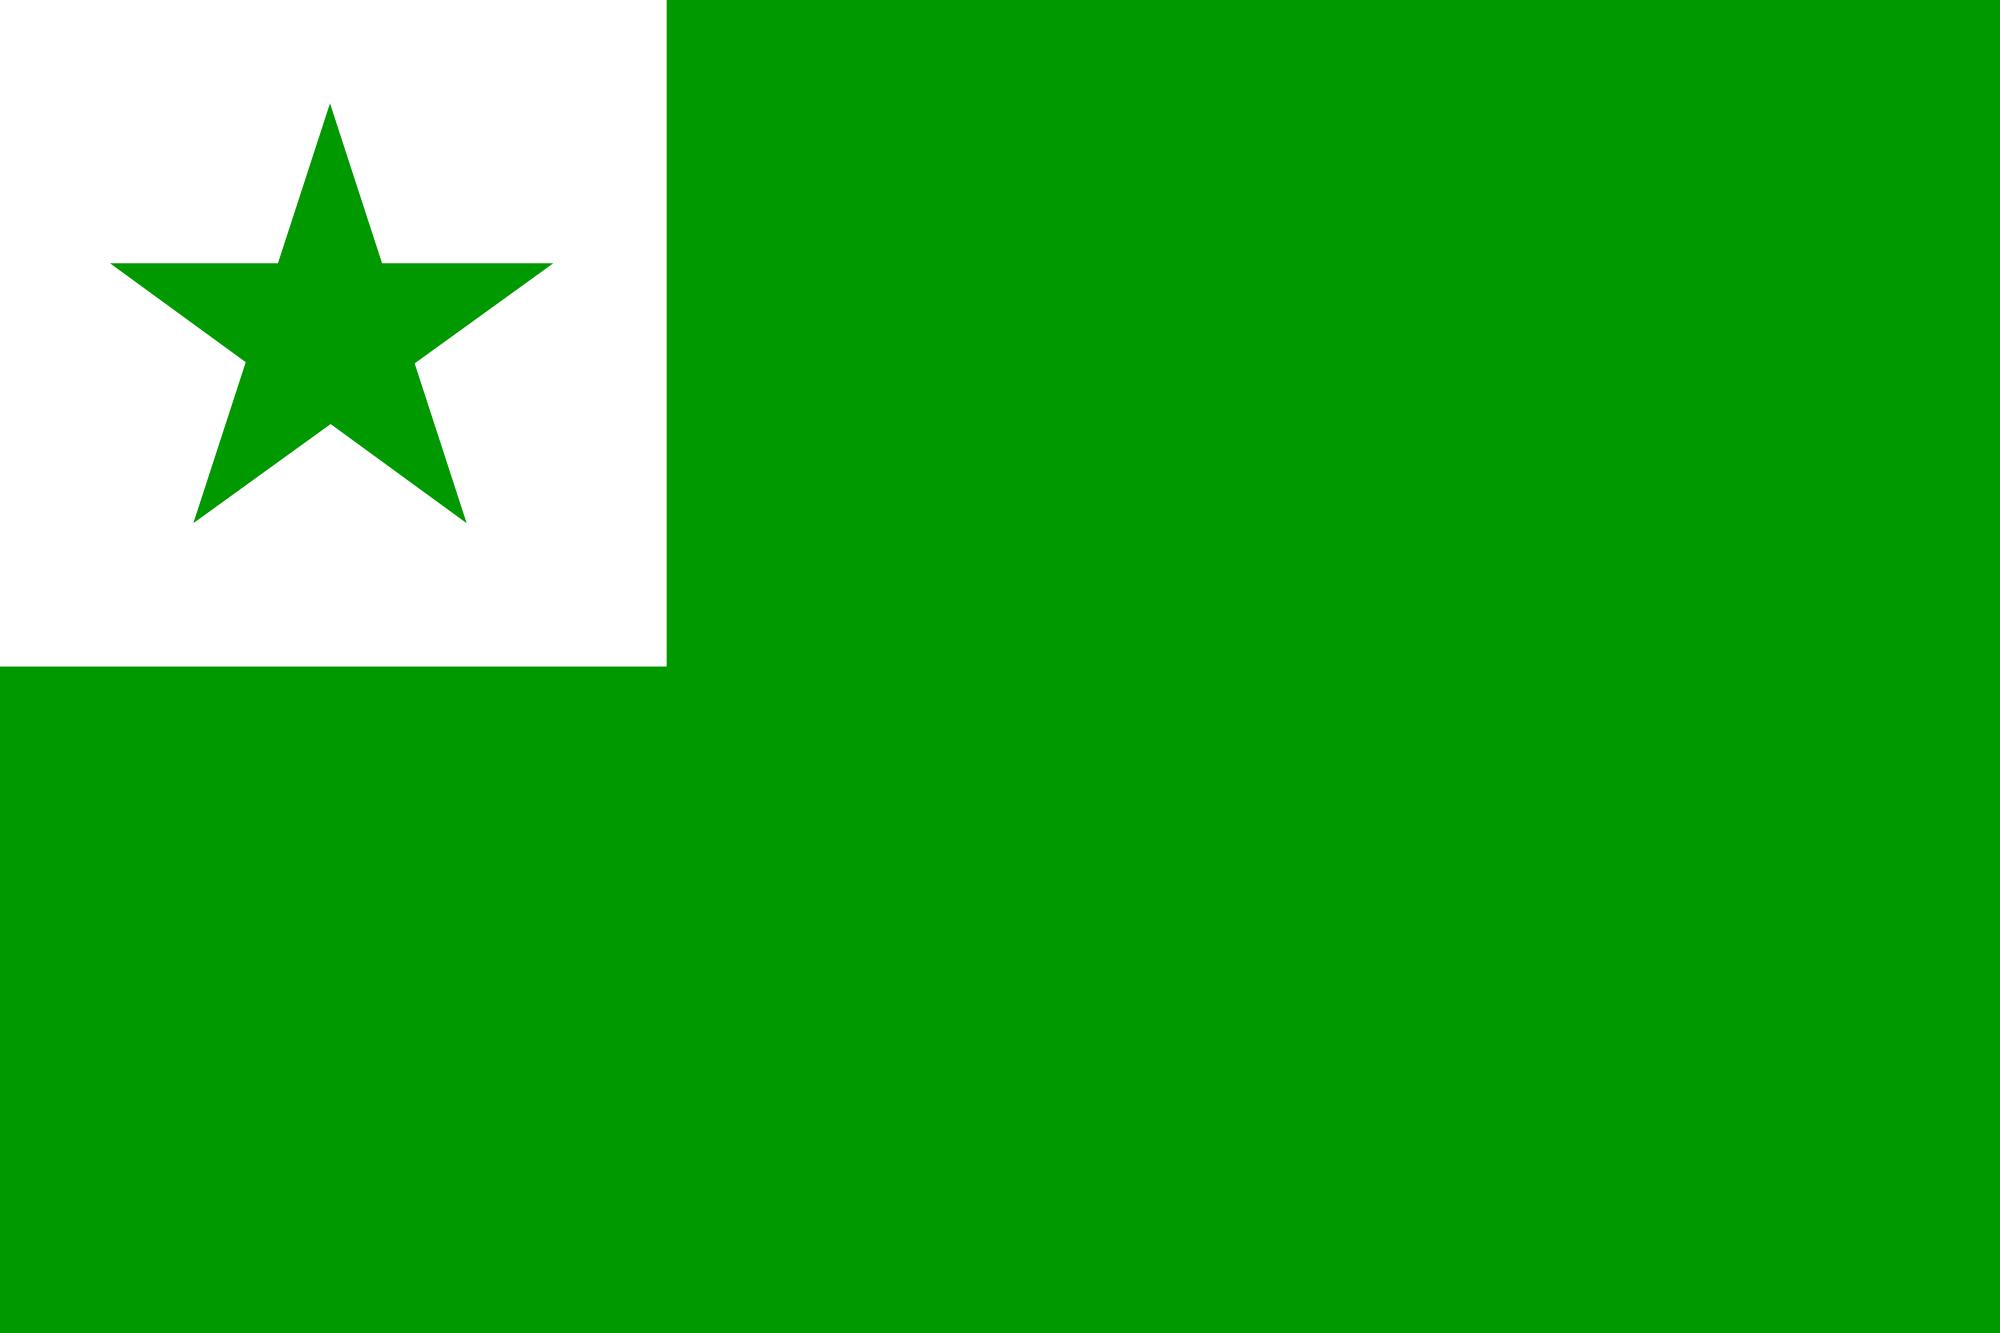 Drapeau Espéranto